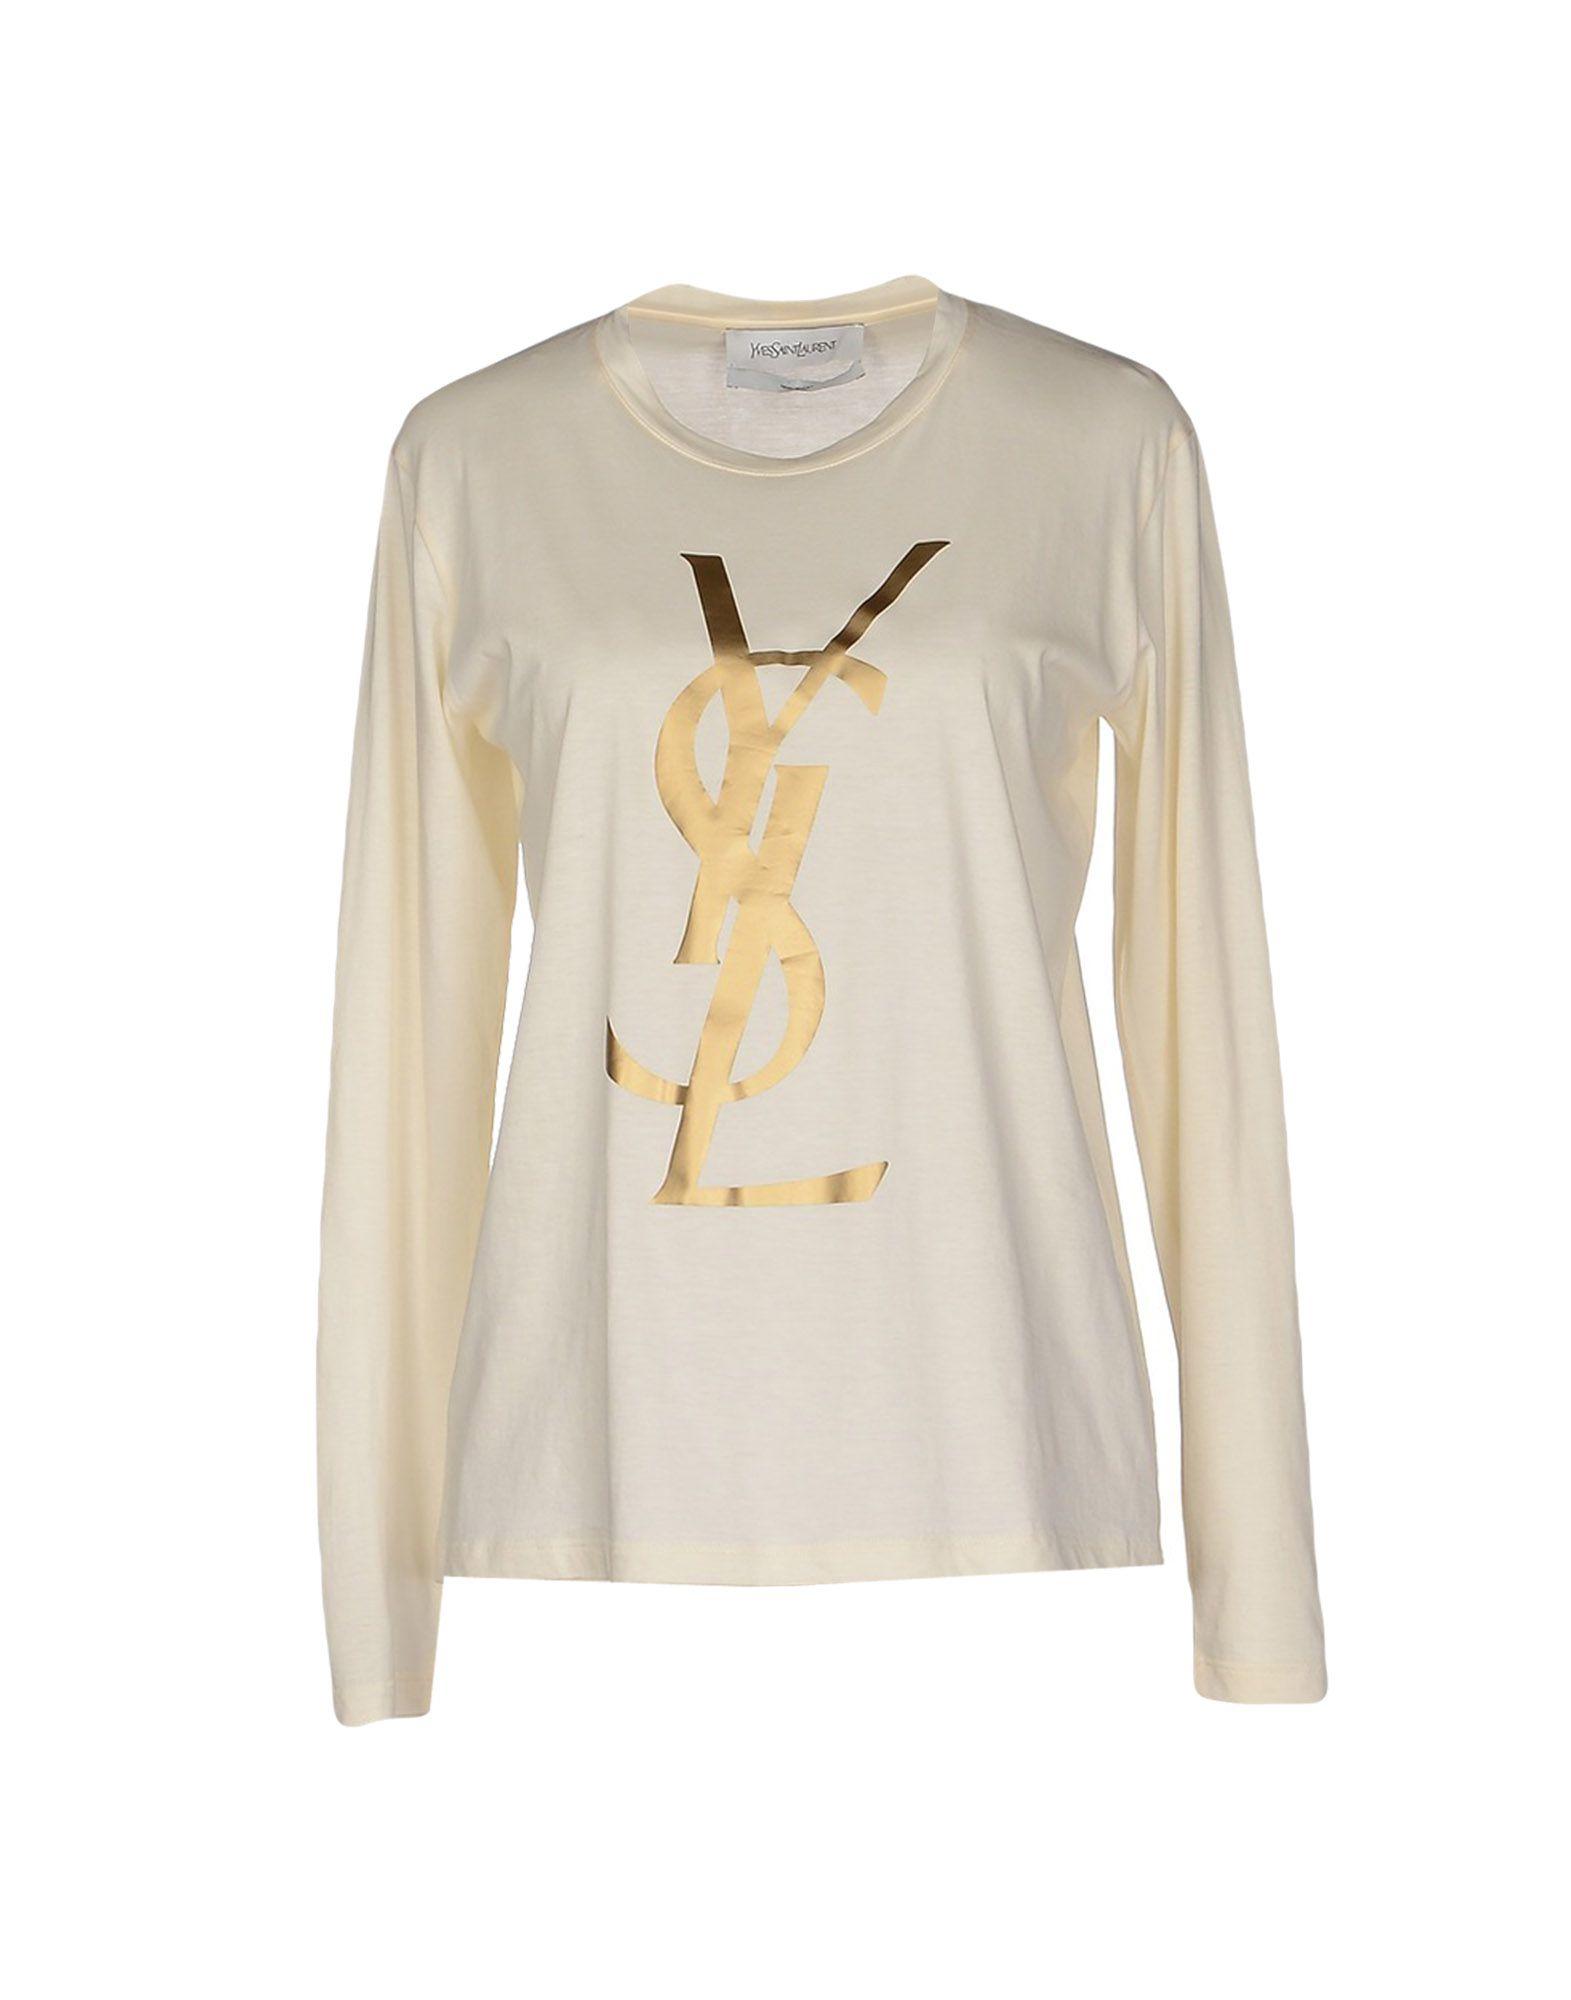 Saint laurent t shirt in white ivory lyst for Yves saint laurent white t shirt